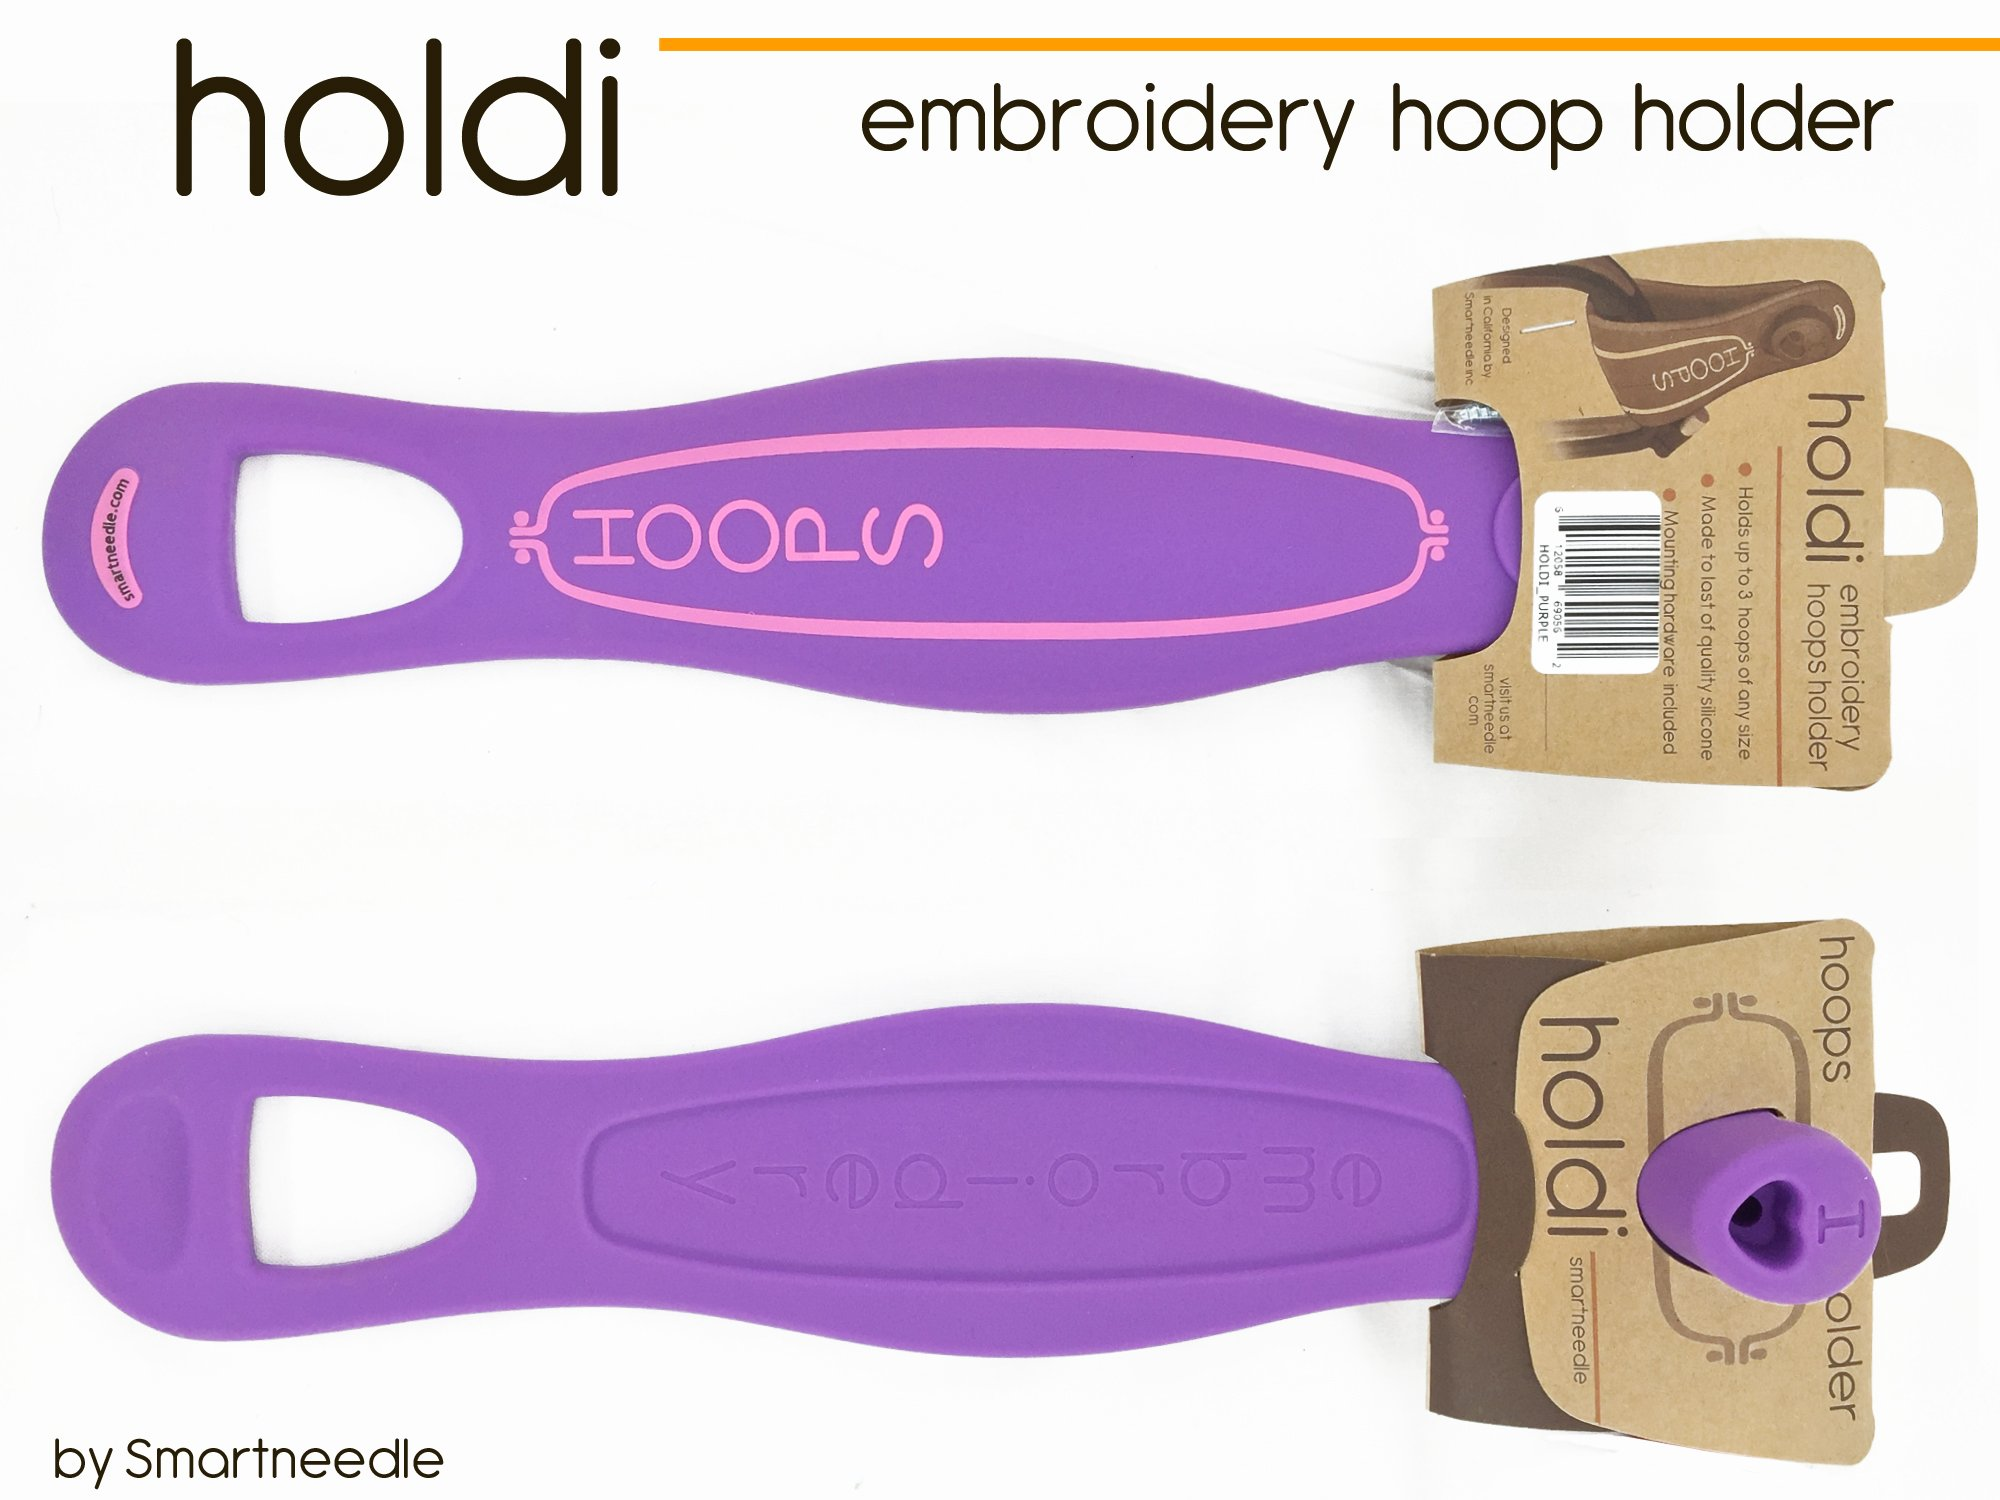 Holdi embroidery hoop holder